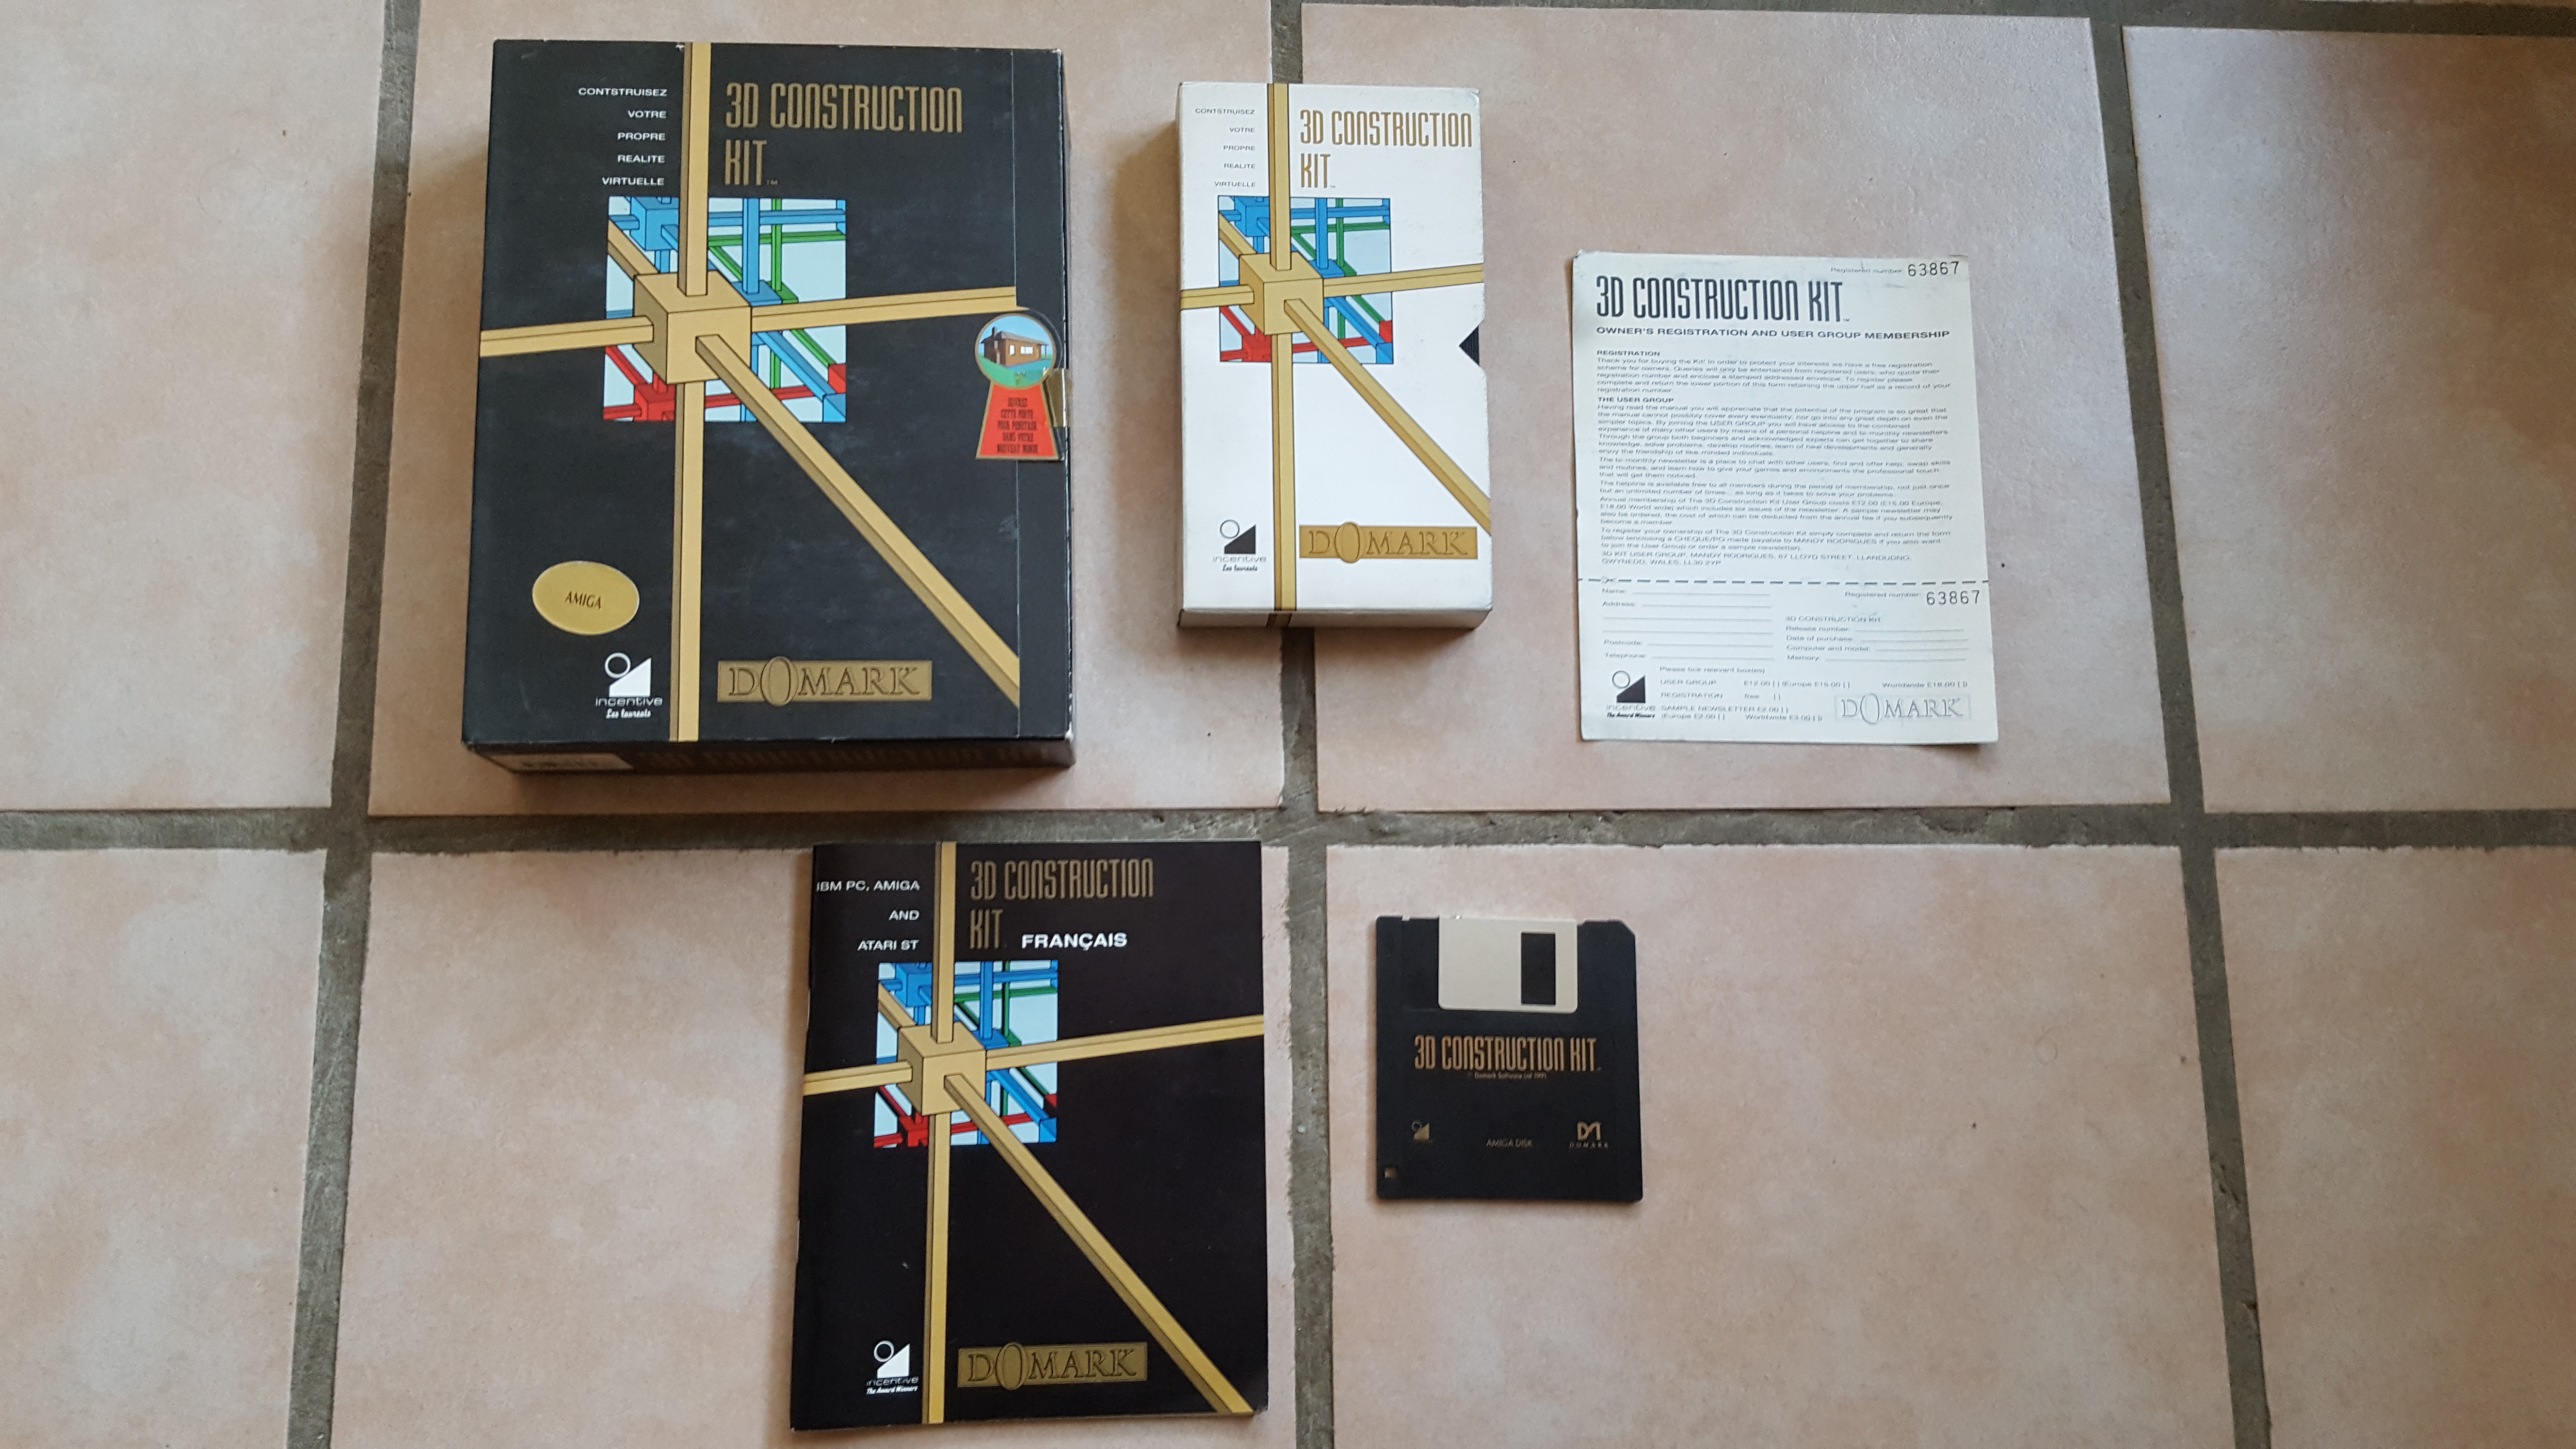 Vente ordinateurs et jeux Atari, Amiga, Amstrad et PC MAJ 20/01 - Page 5 R9GZ8